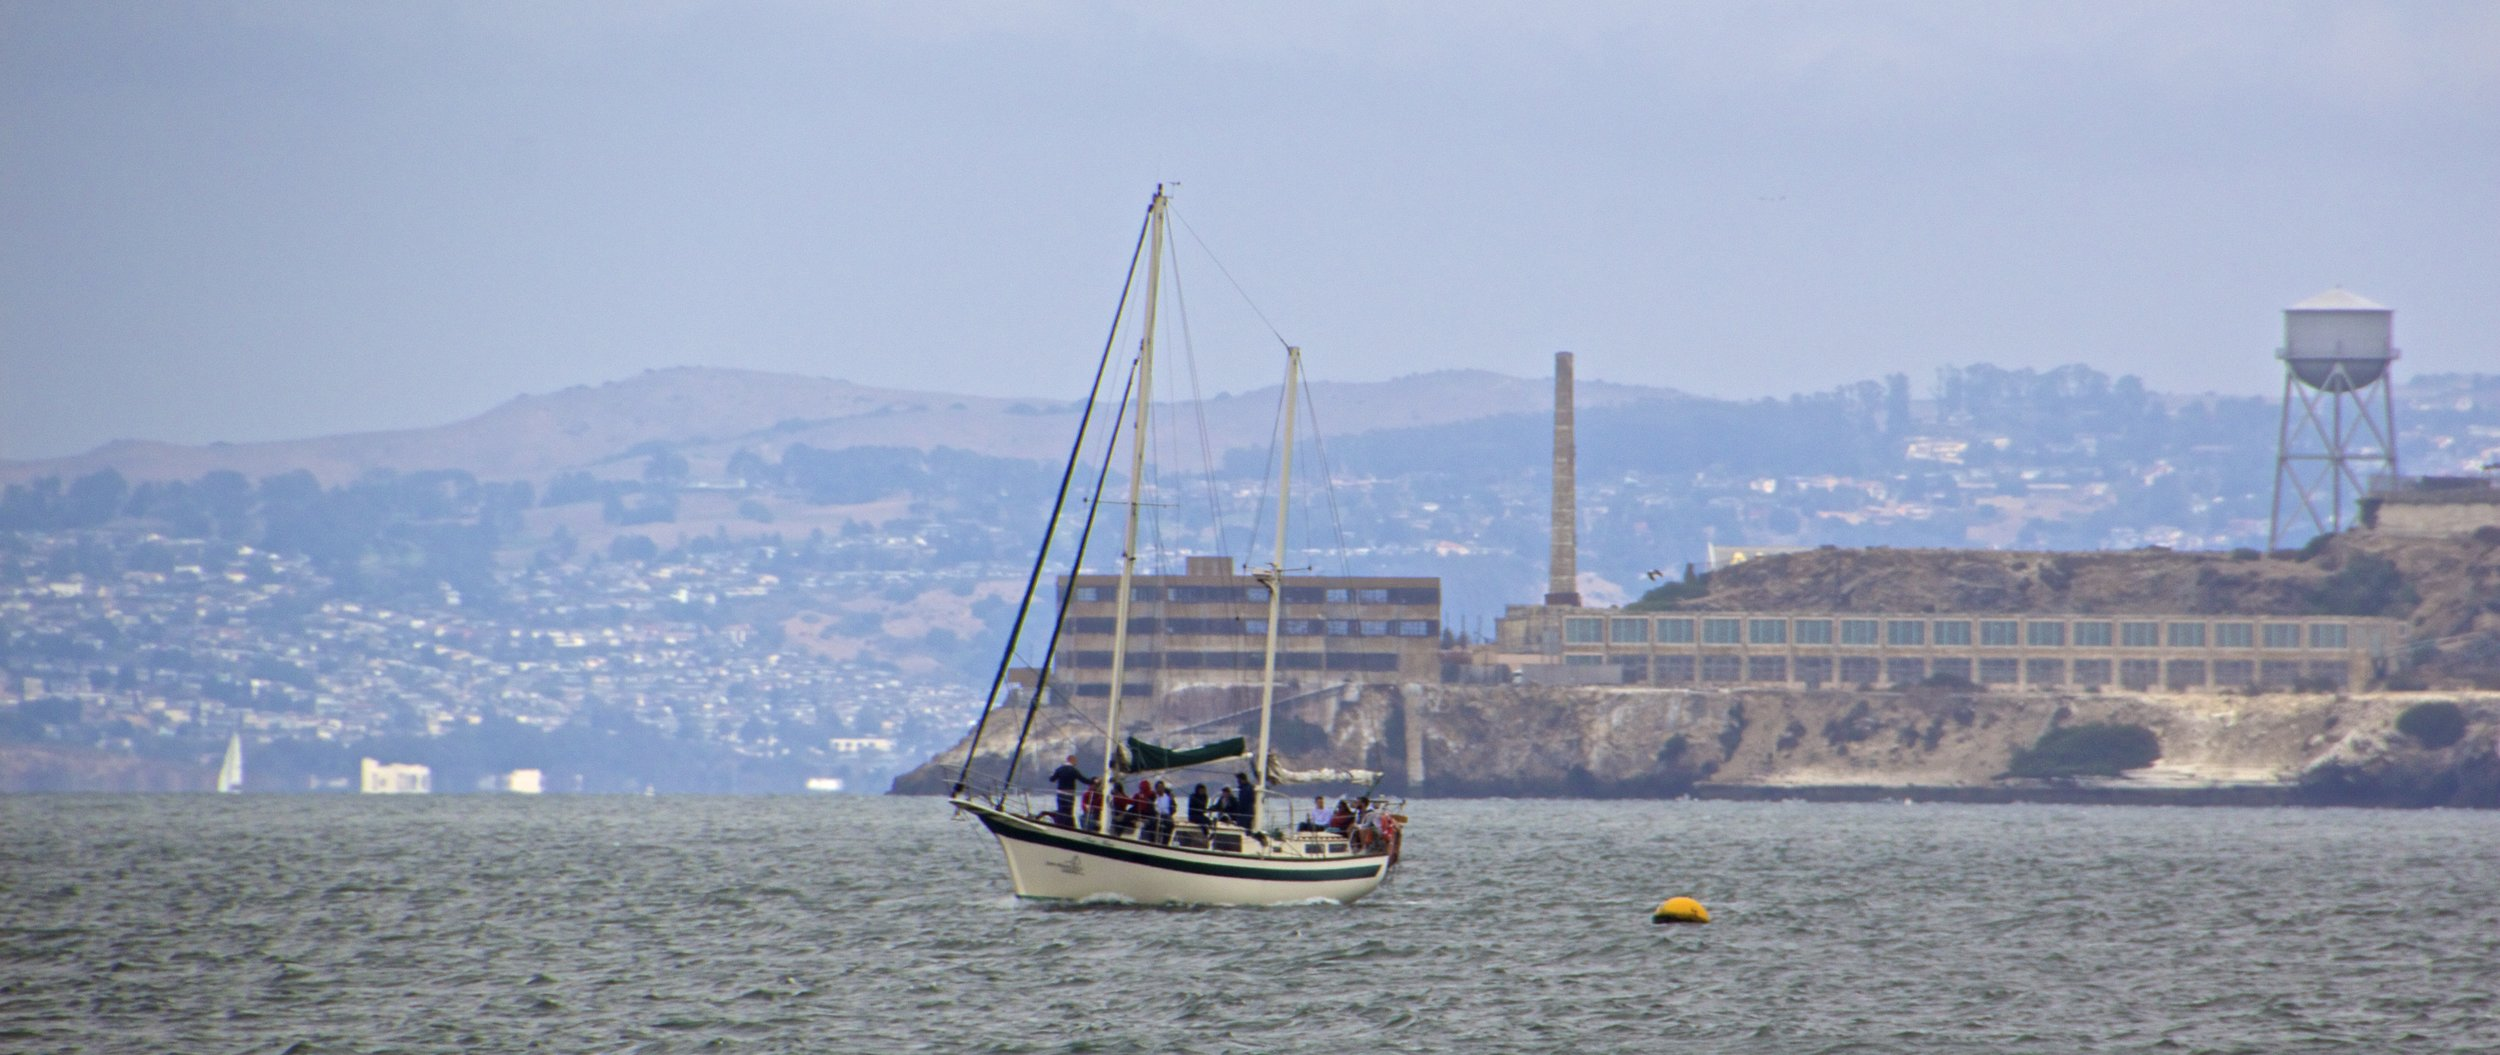 Alcatraz San Francisco 1.jpg